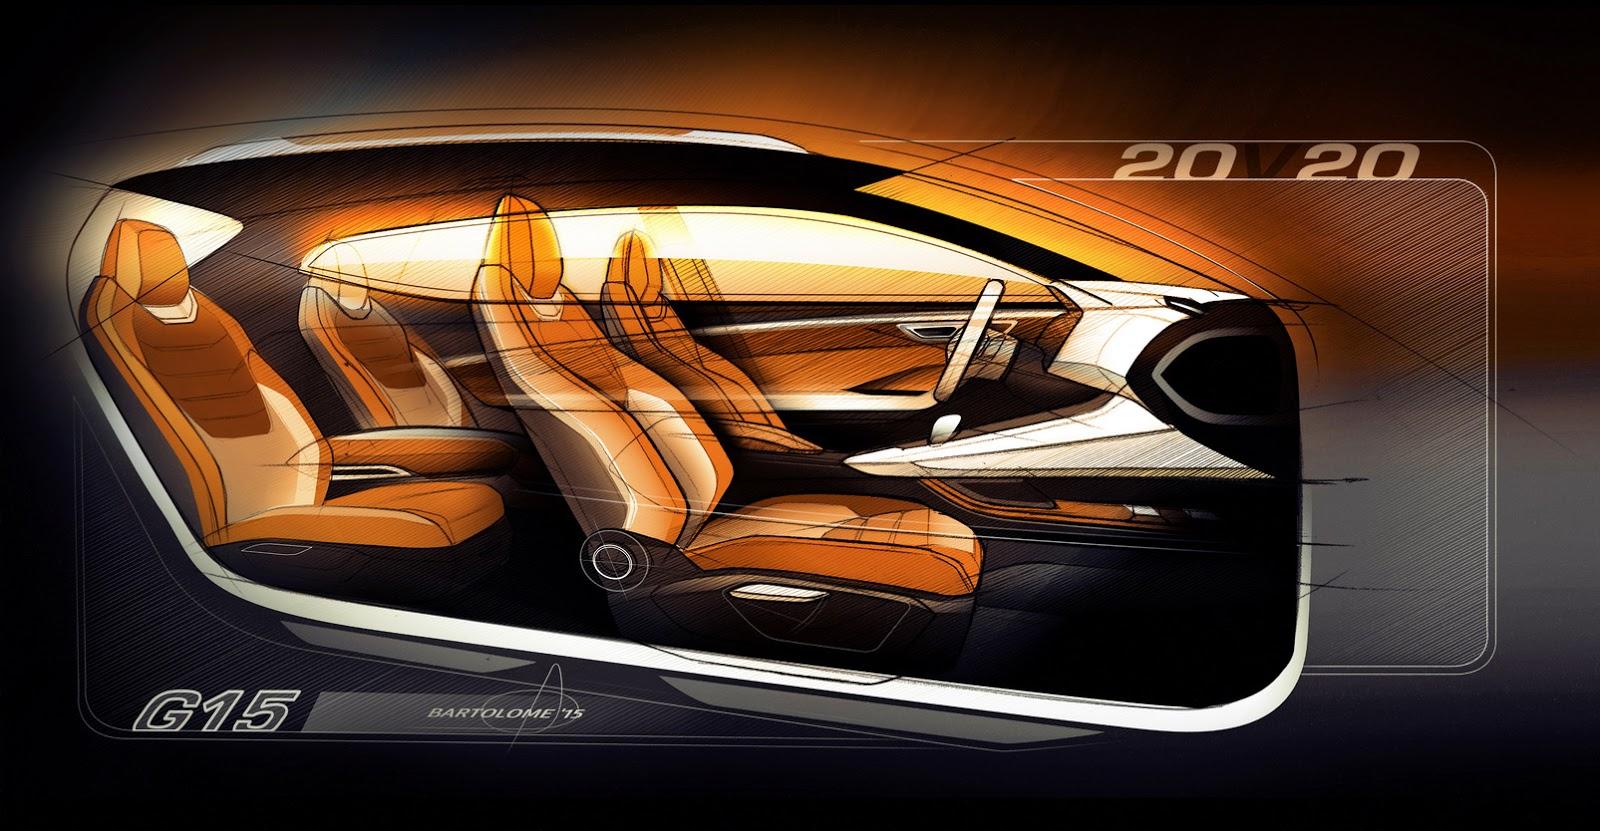 2015 Seat 20v20 Concepts